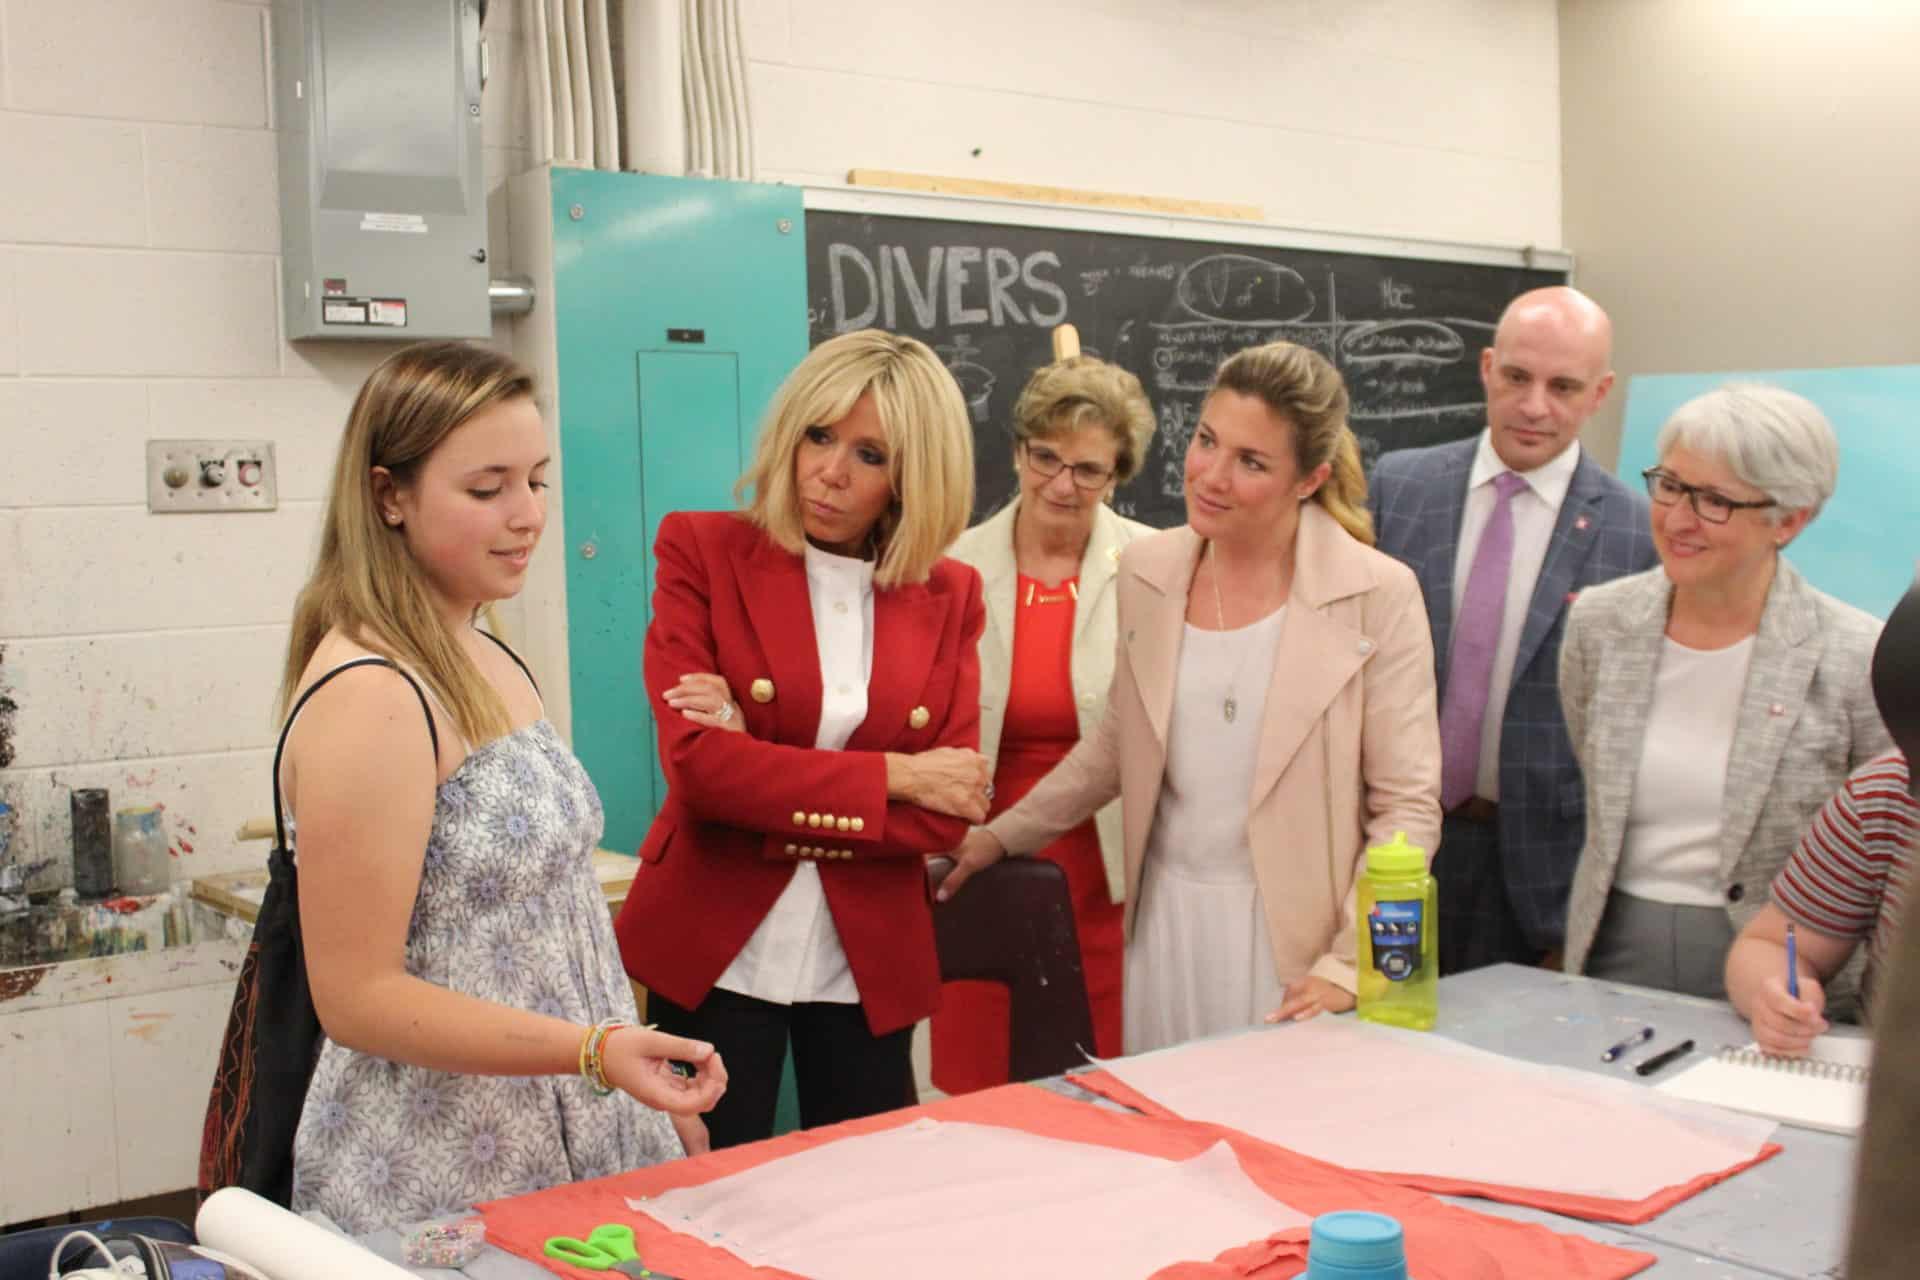 Brigitte-Macron-et-Sohpie-Grégoire-Trudeau-14.jpg